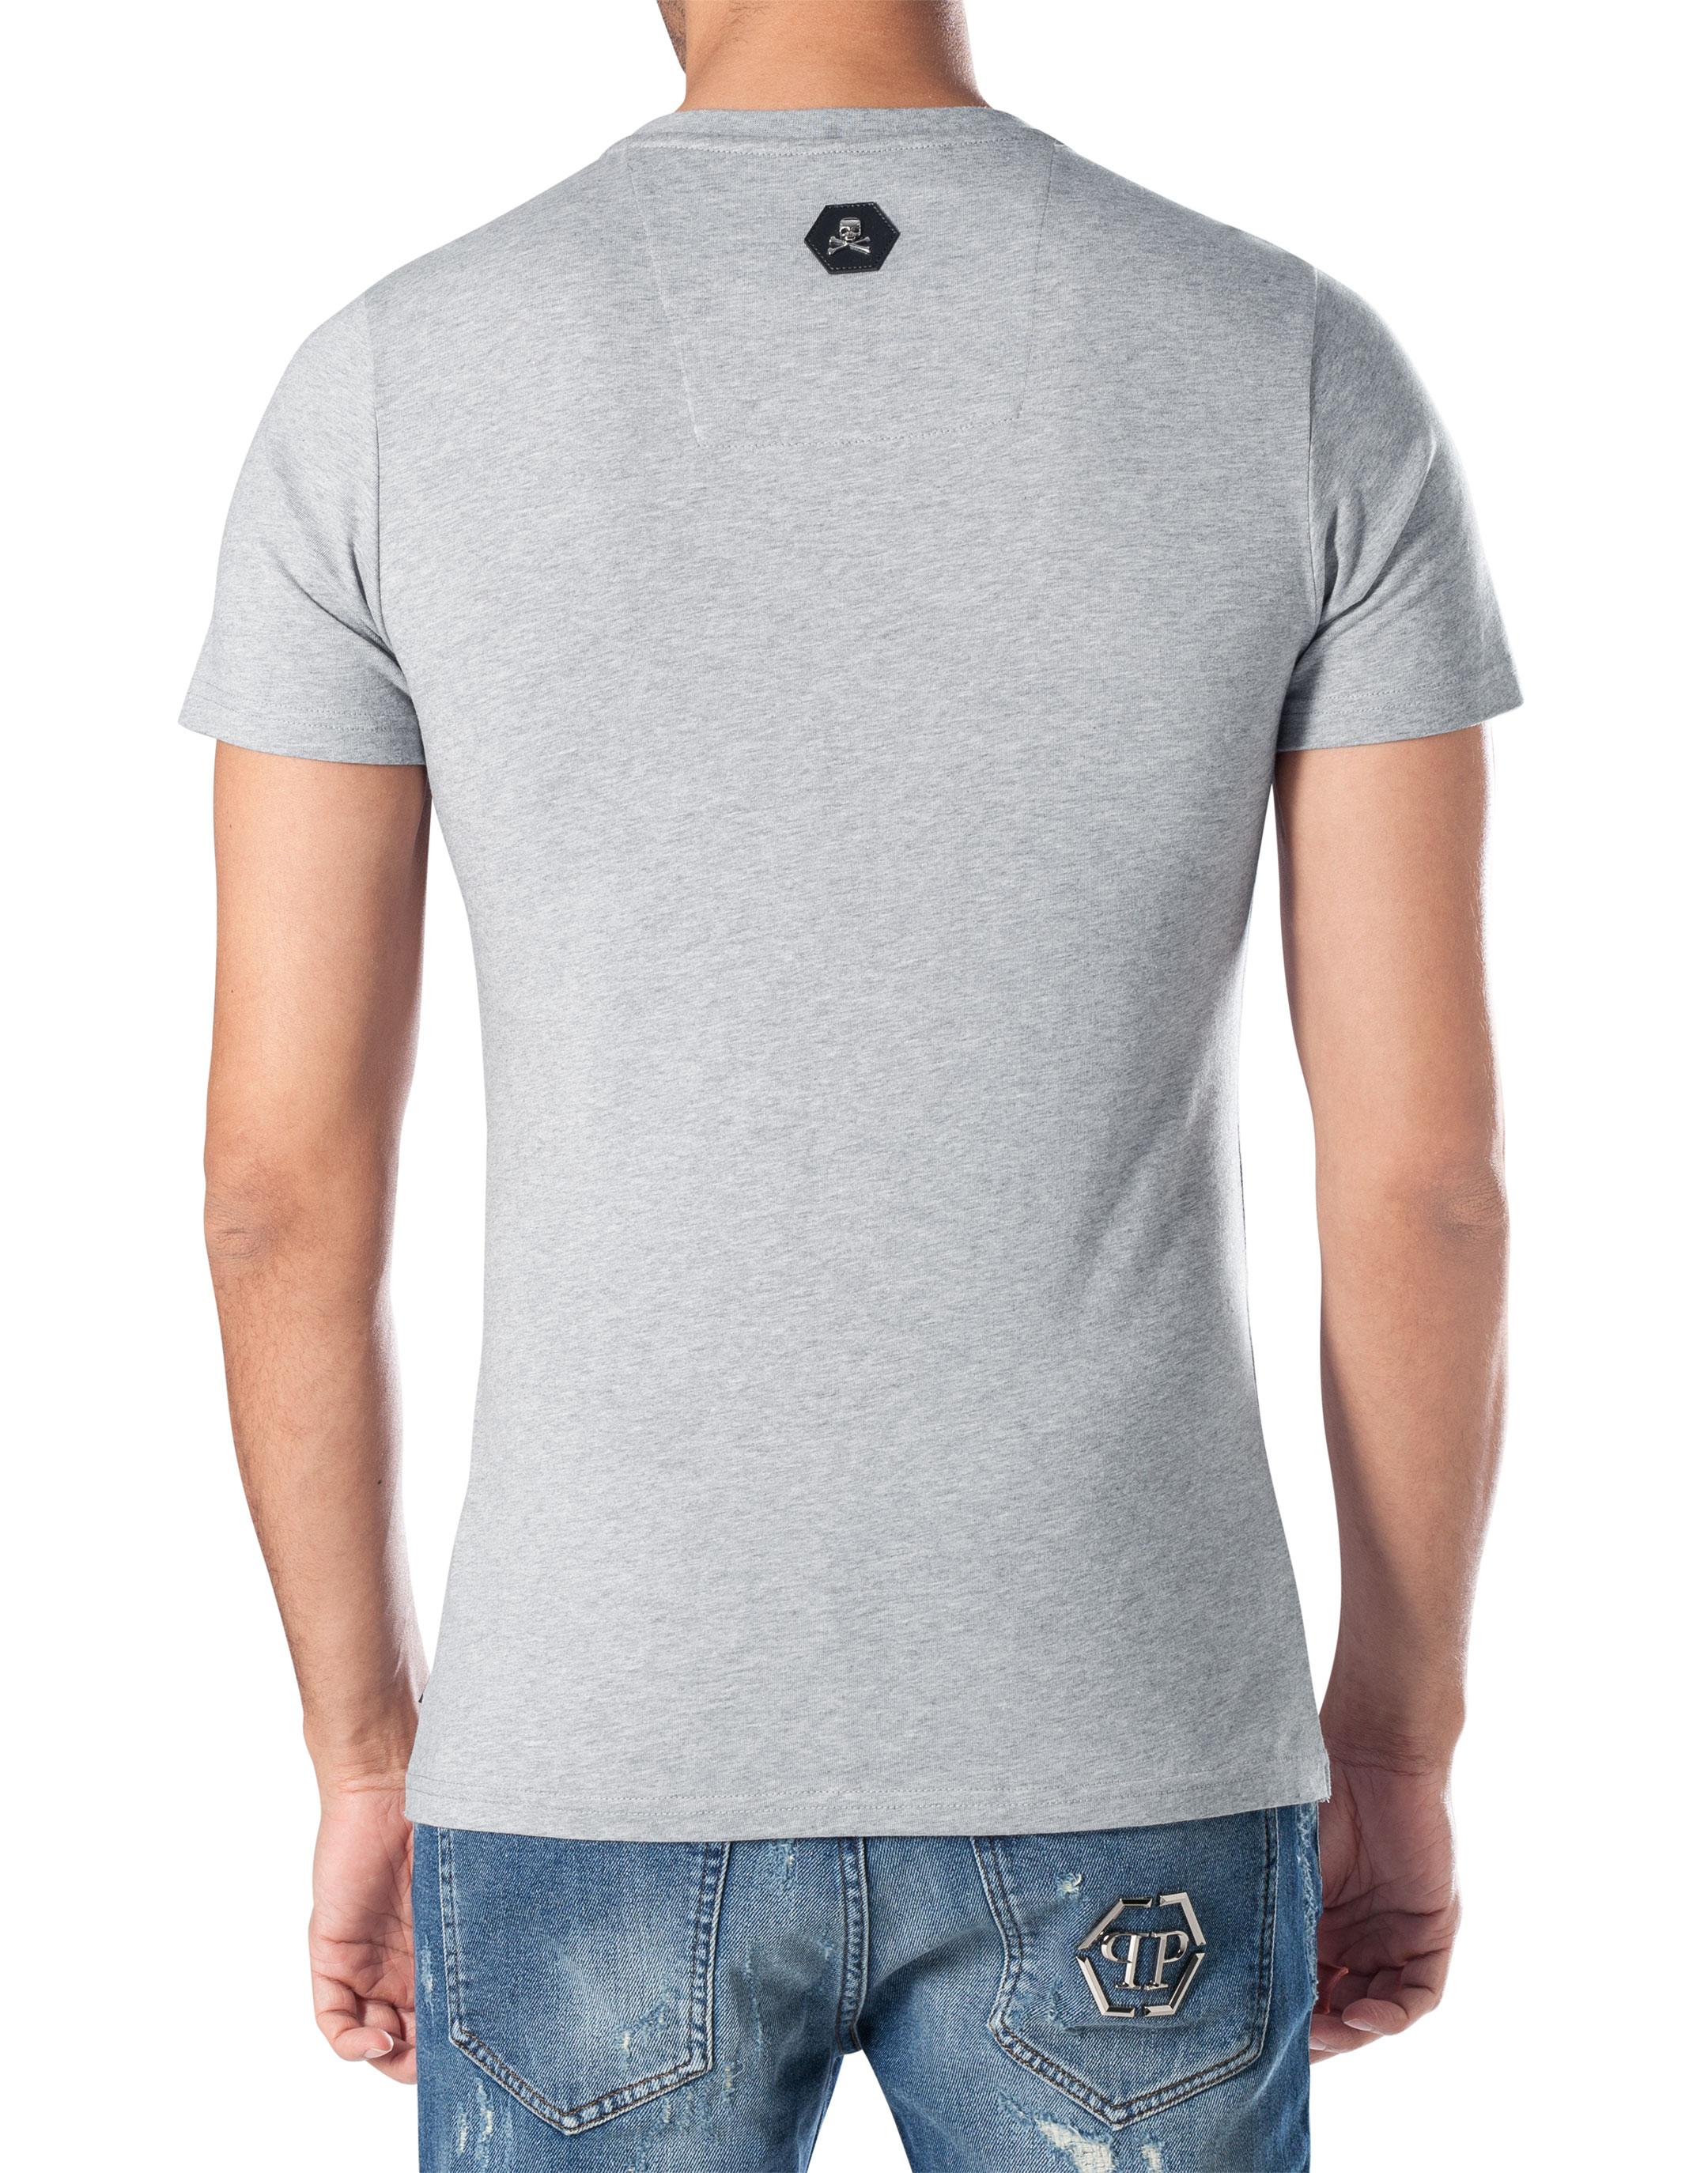 WW2 Sean Connery Un pont trop loin Hommage S-5XL T-shirt Homme